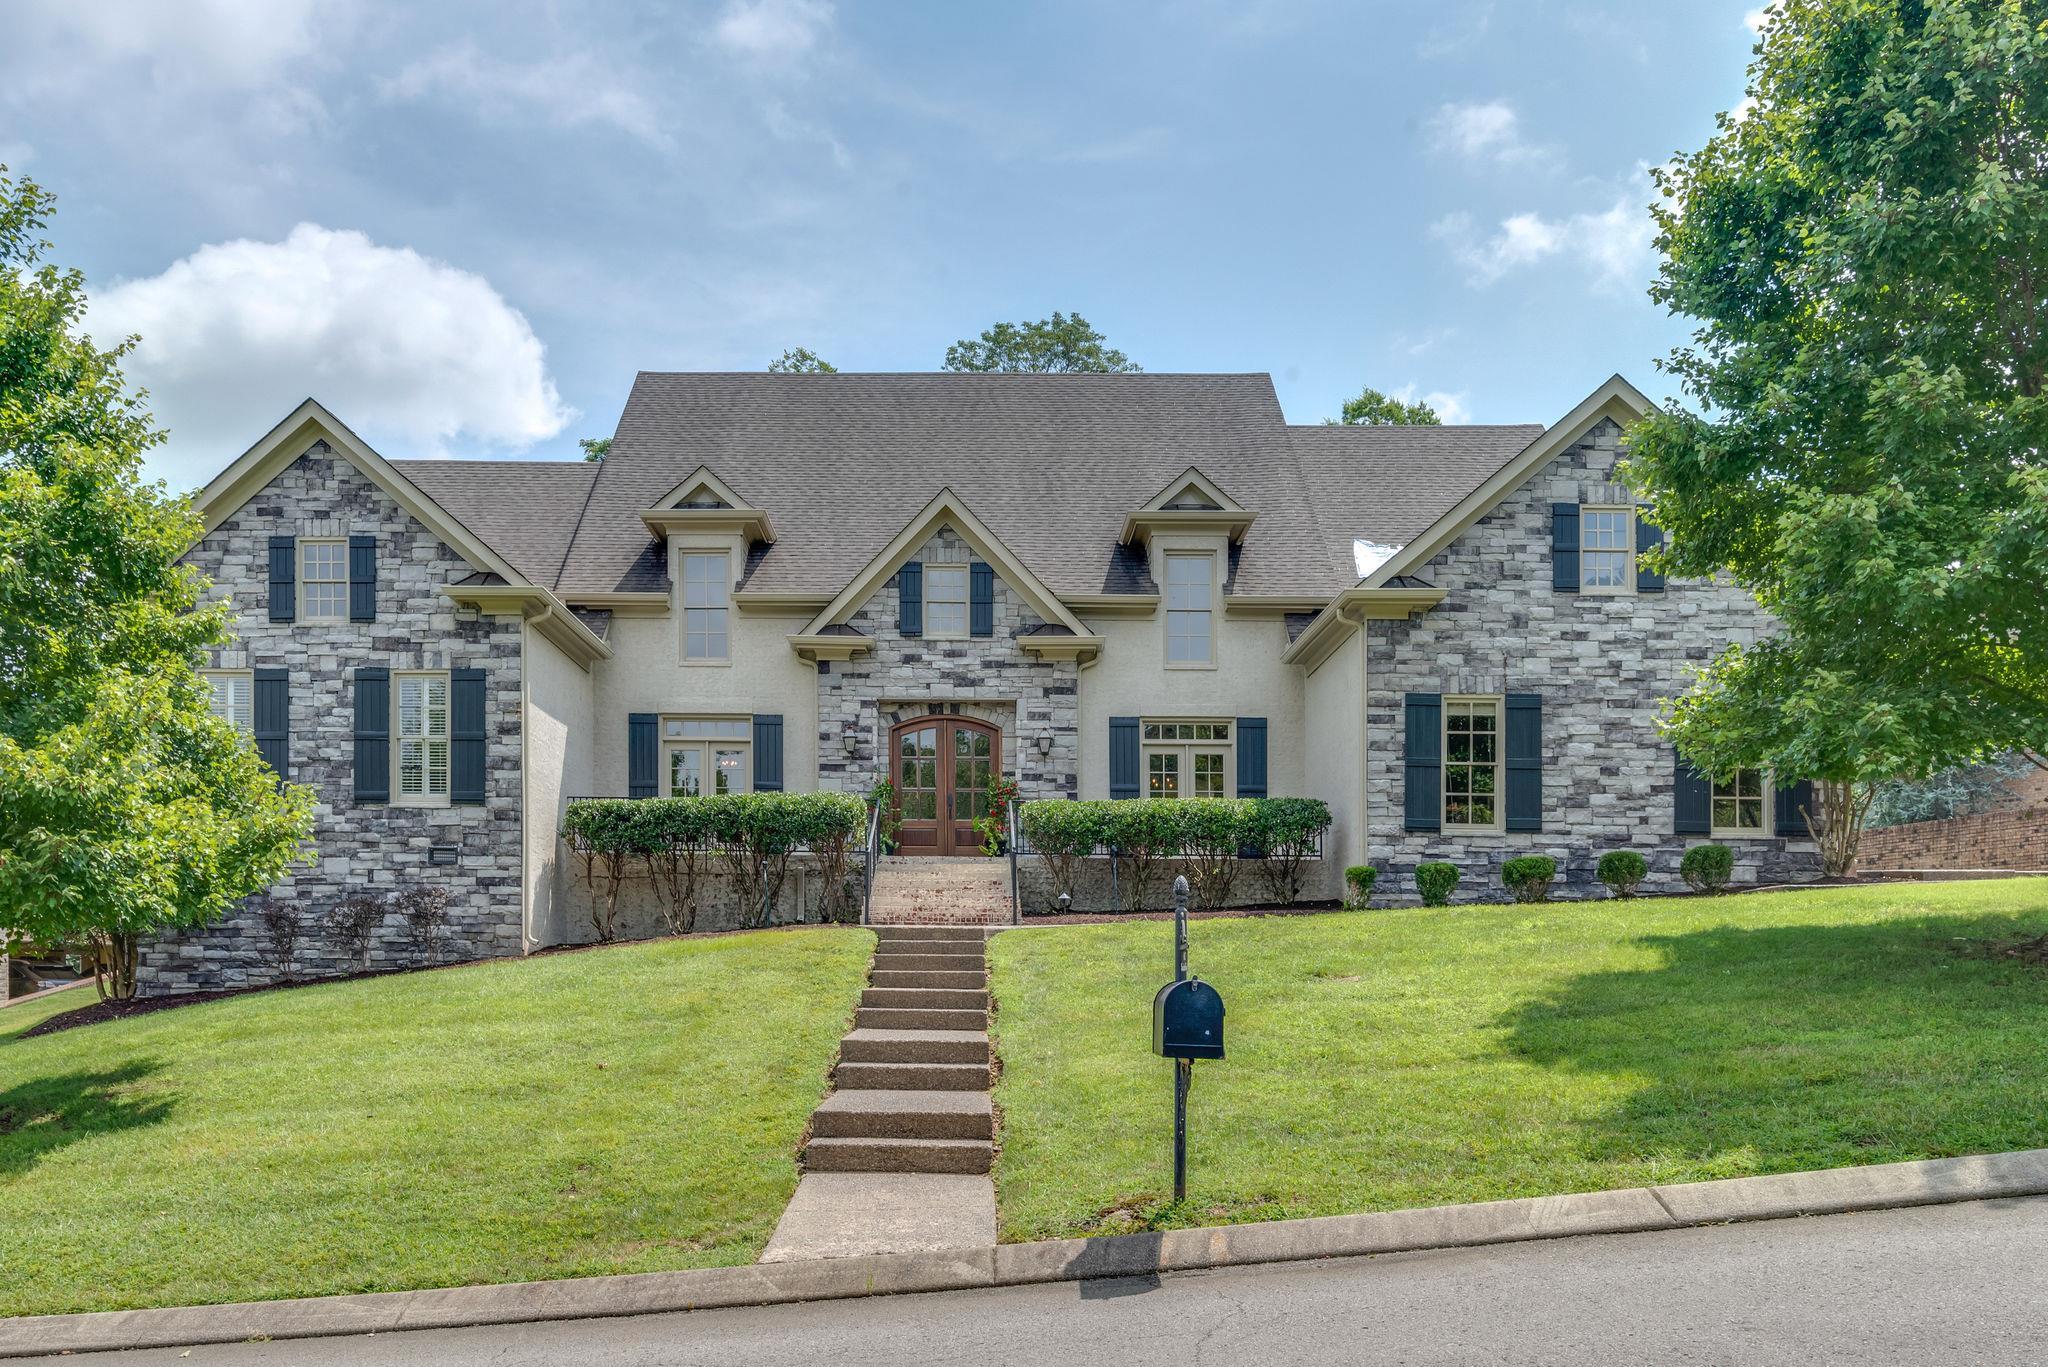 412 Sandcastle Rd, Franklin, TN 37069 - Franklin, TN real estate listing